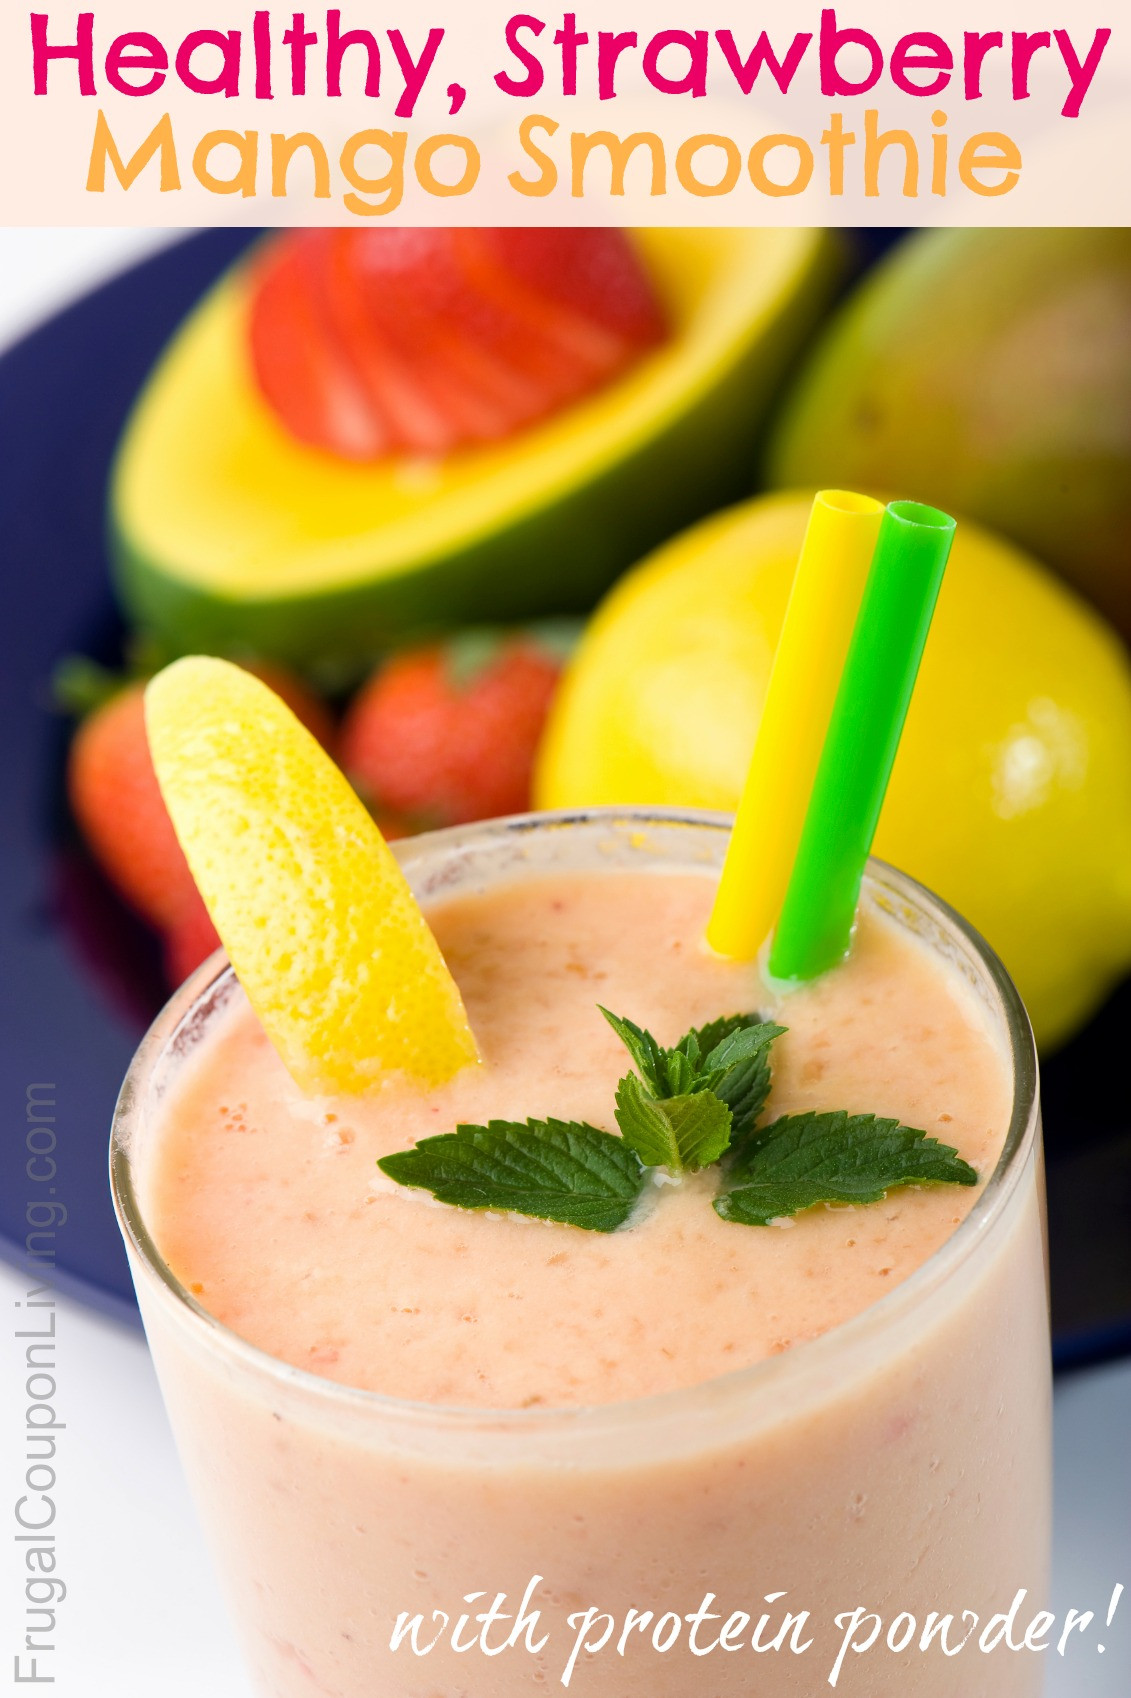 Healthy Mango Recipes  Healthy Strawberry Mango Smoothie Recipe with Protein Powder